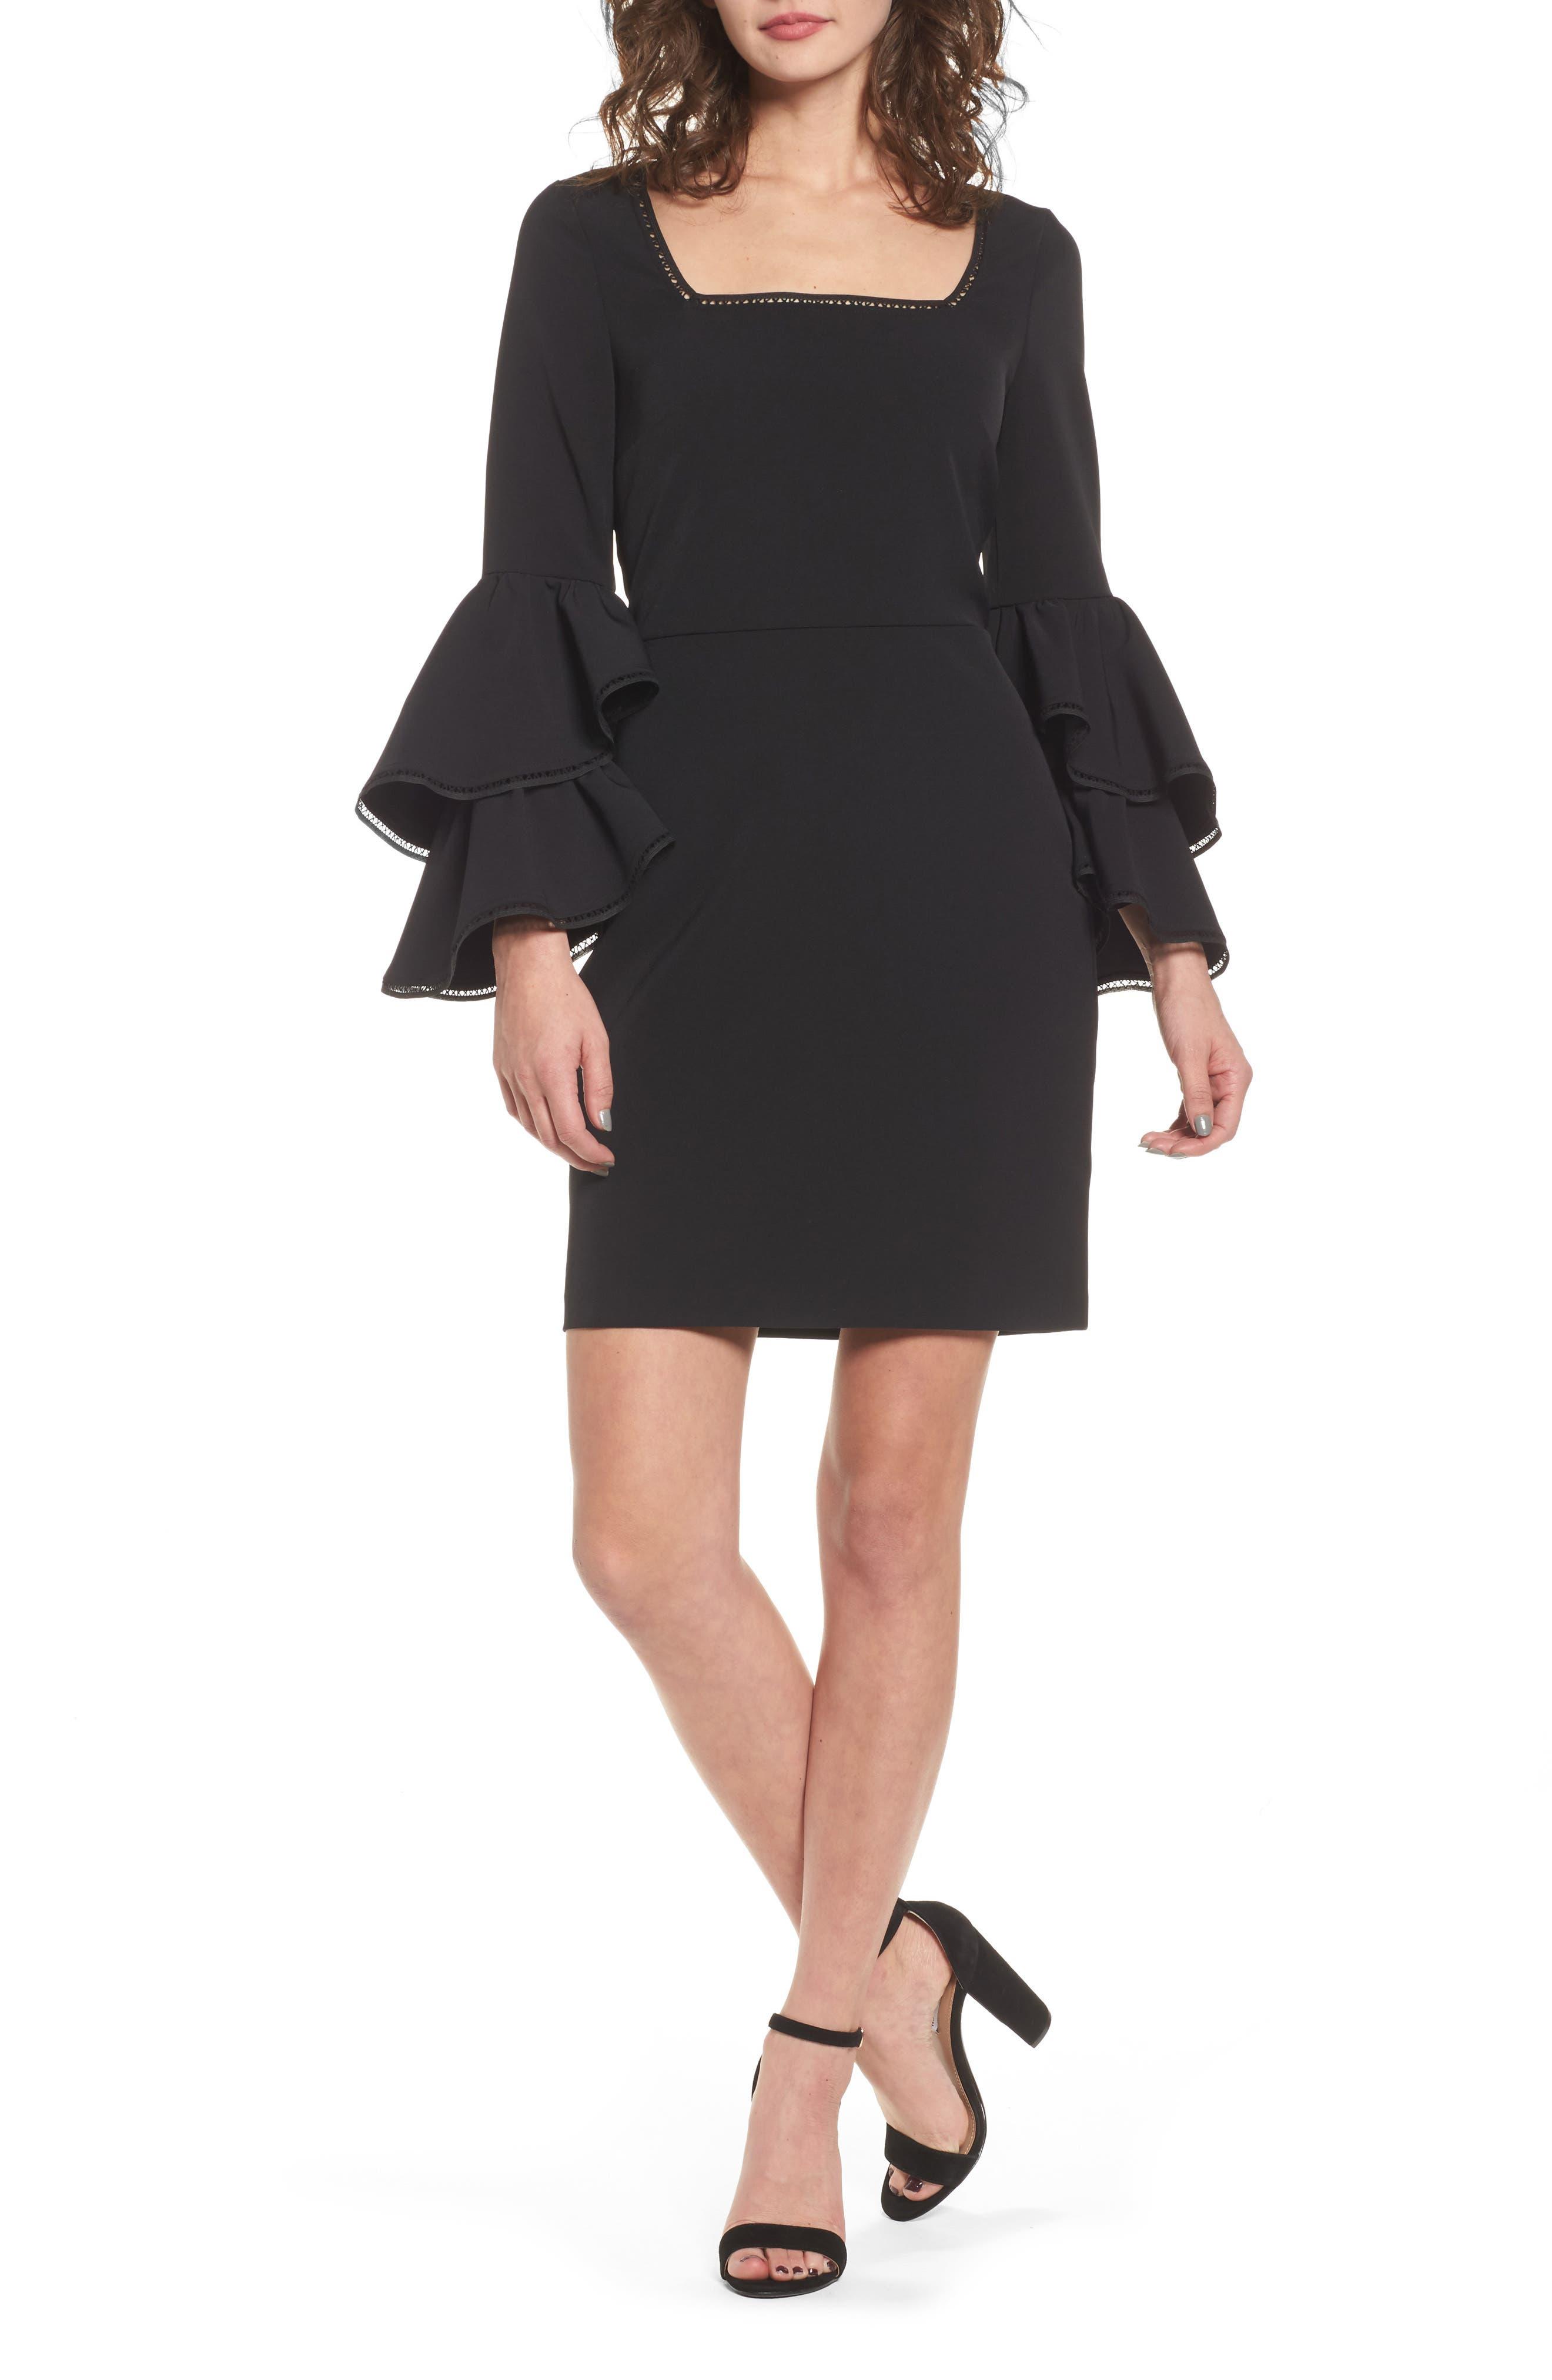 Emmie Ruffle Sleeve Sheath Dress,                             Main thumbnail 1, color,                             001